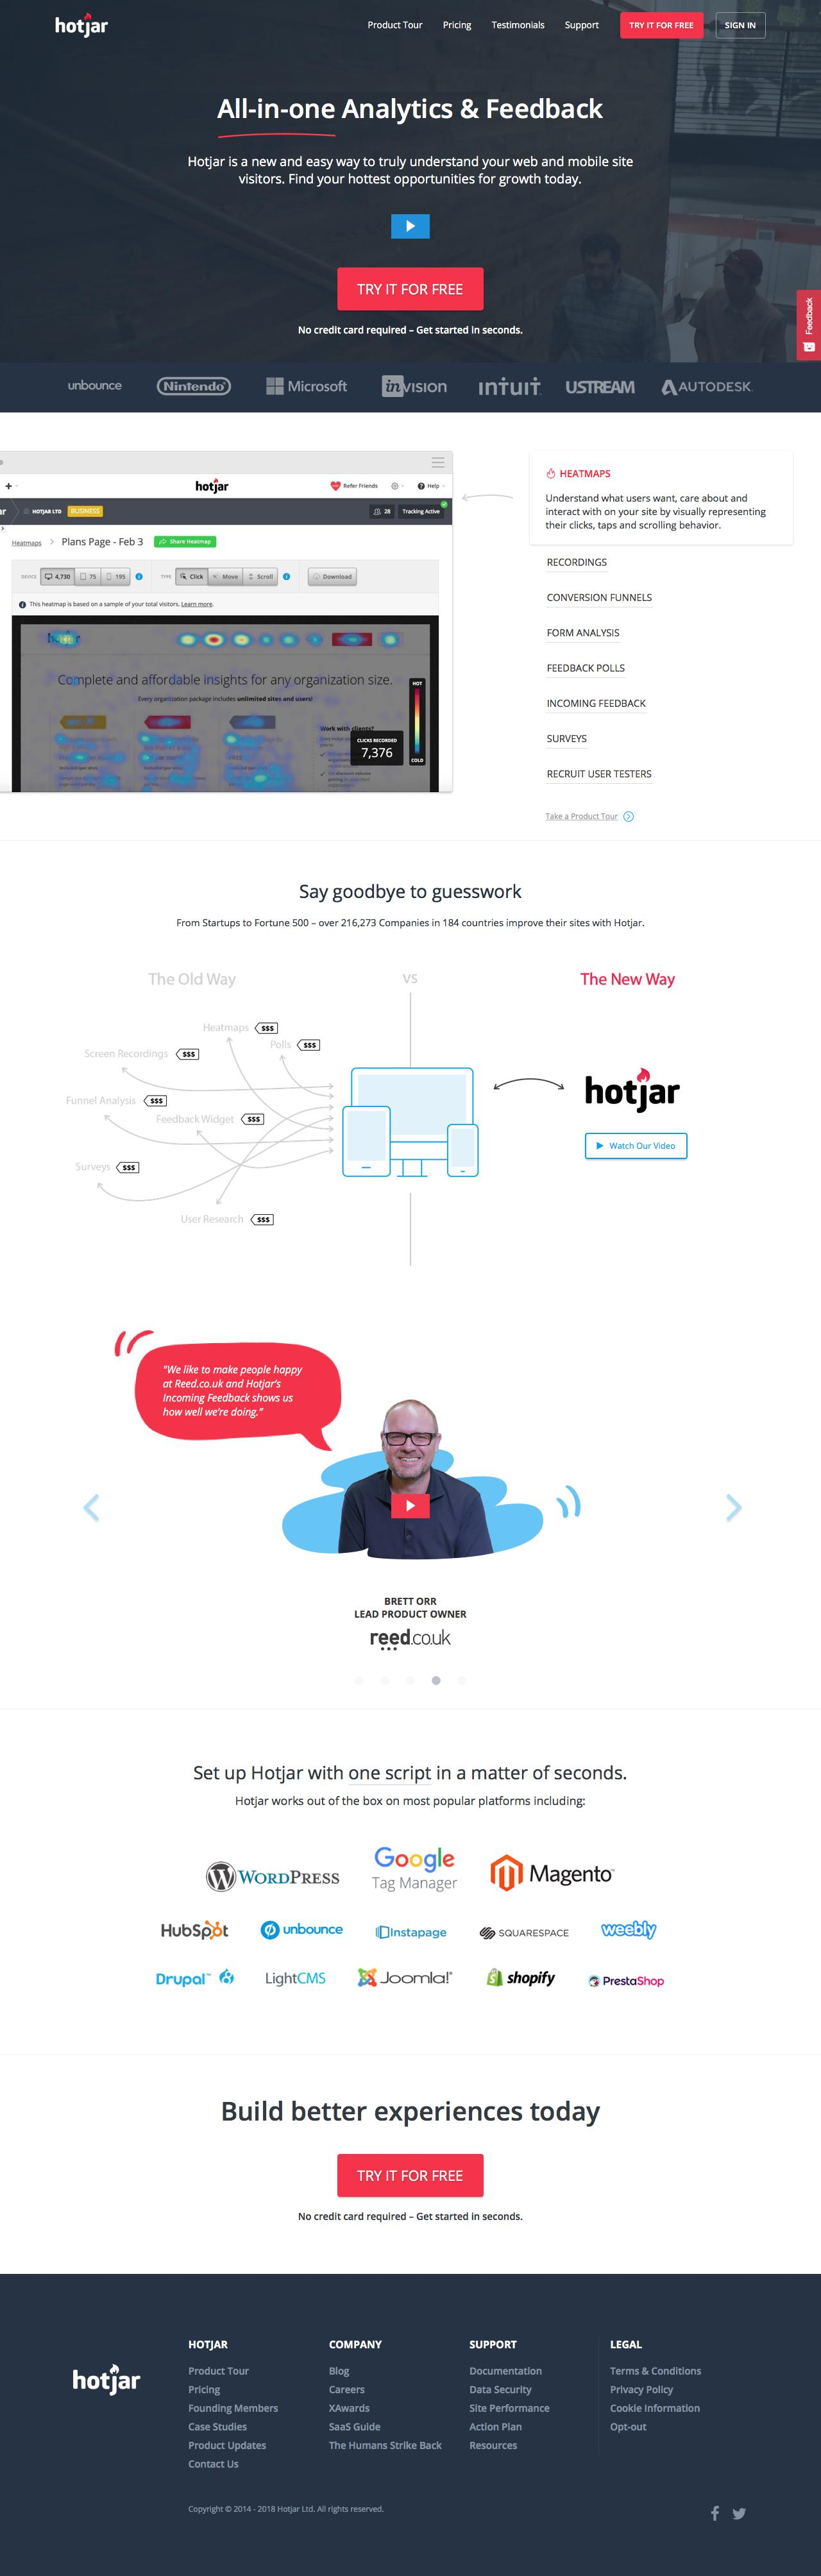 Screenshot of hotjar.com - Hotjar - Heatmaps, Visitor Recordings, Conversion Funnels, Form Analytics, Feedback Polls and Surveys in One Platform - captured March 28, 2018